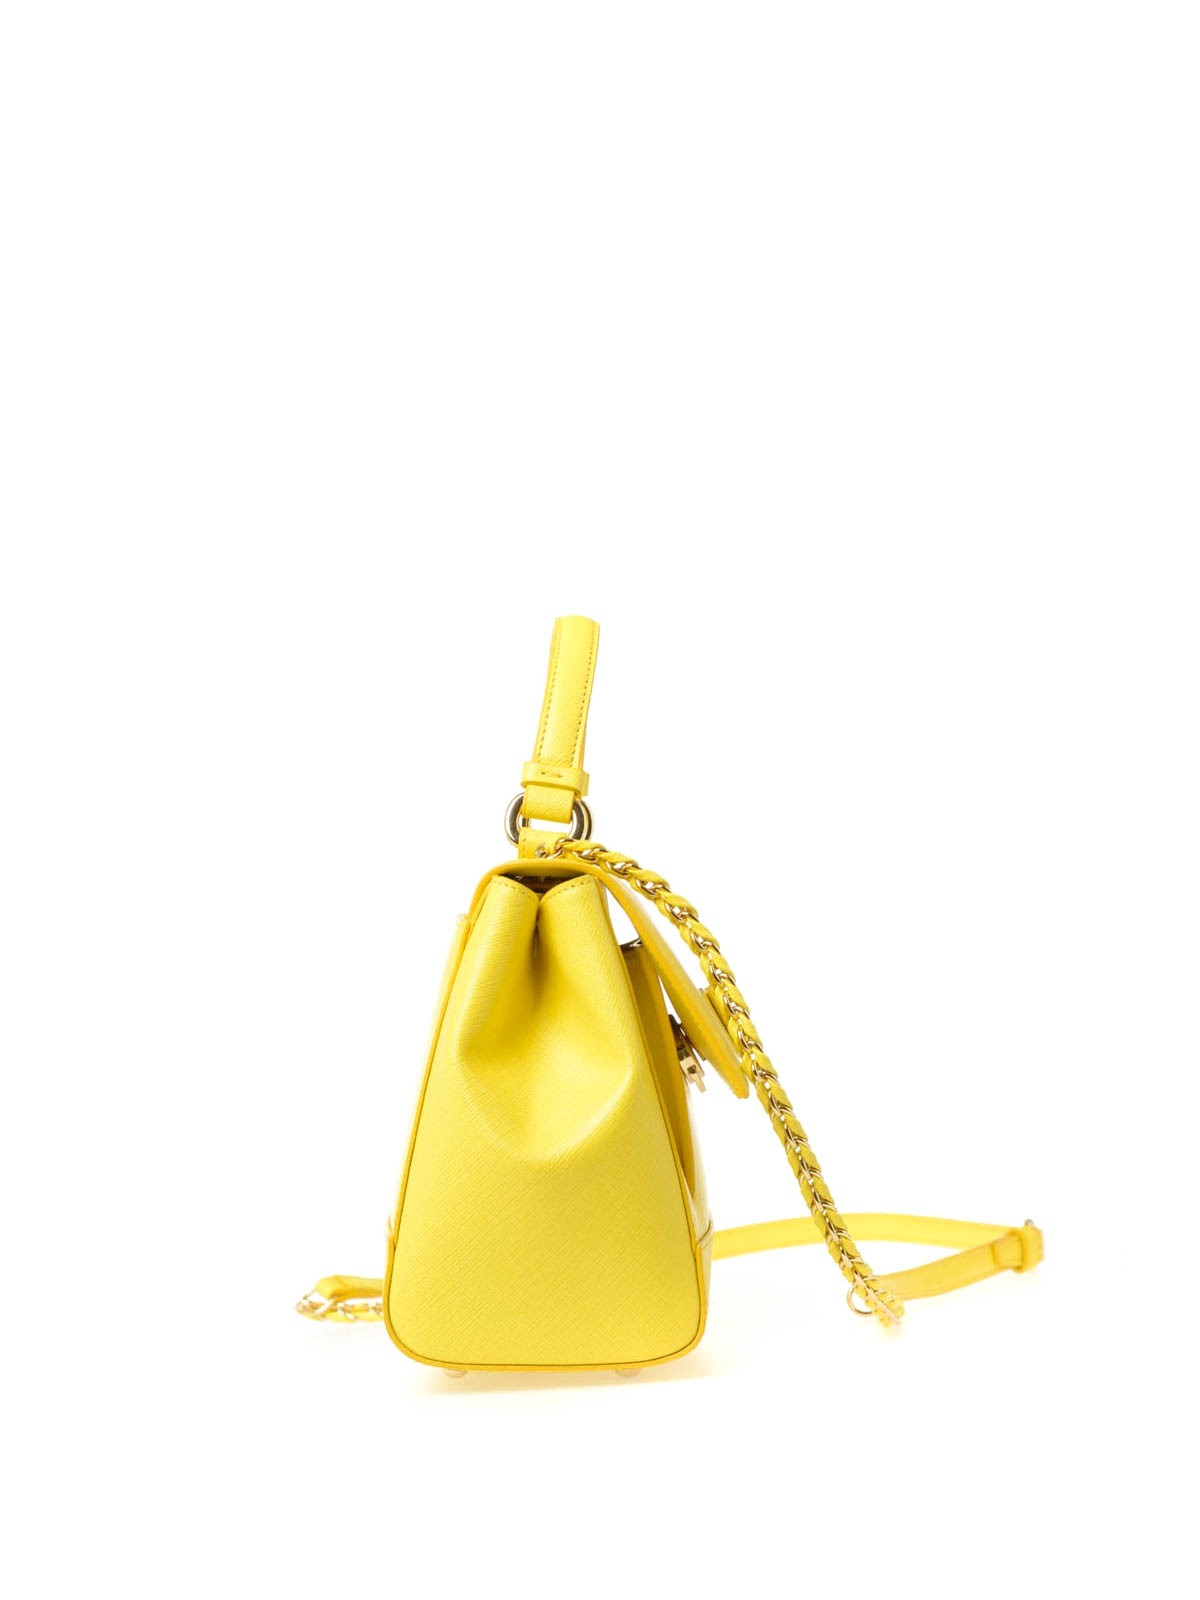 af47254e1faa Salvatore Ferragamo - Carrie shoulder bag - shoulder bags - 629104 ...